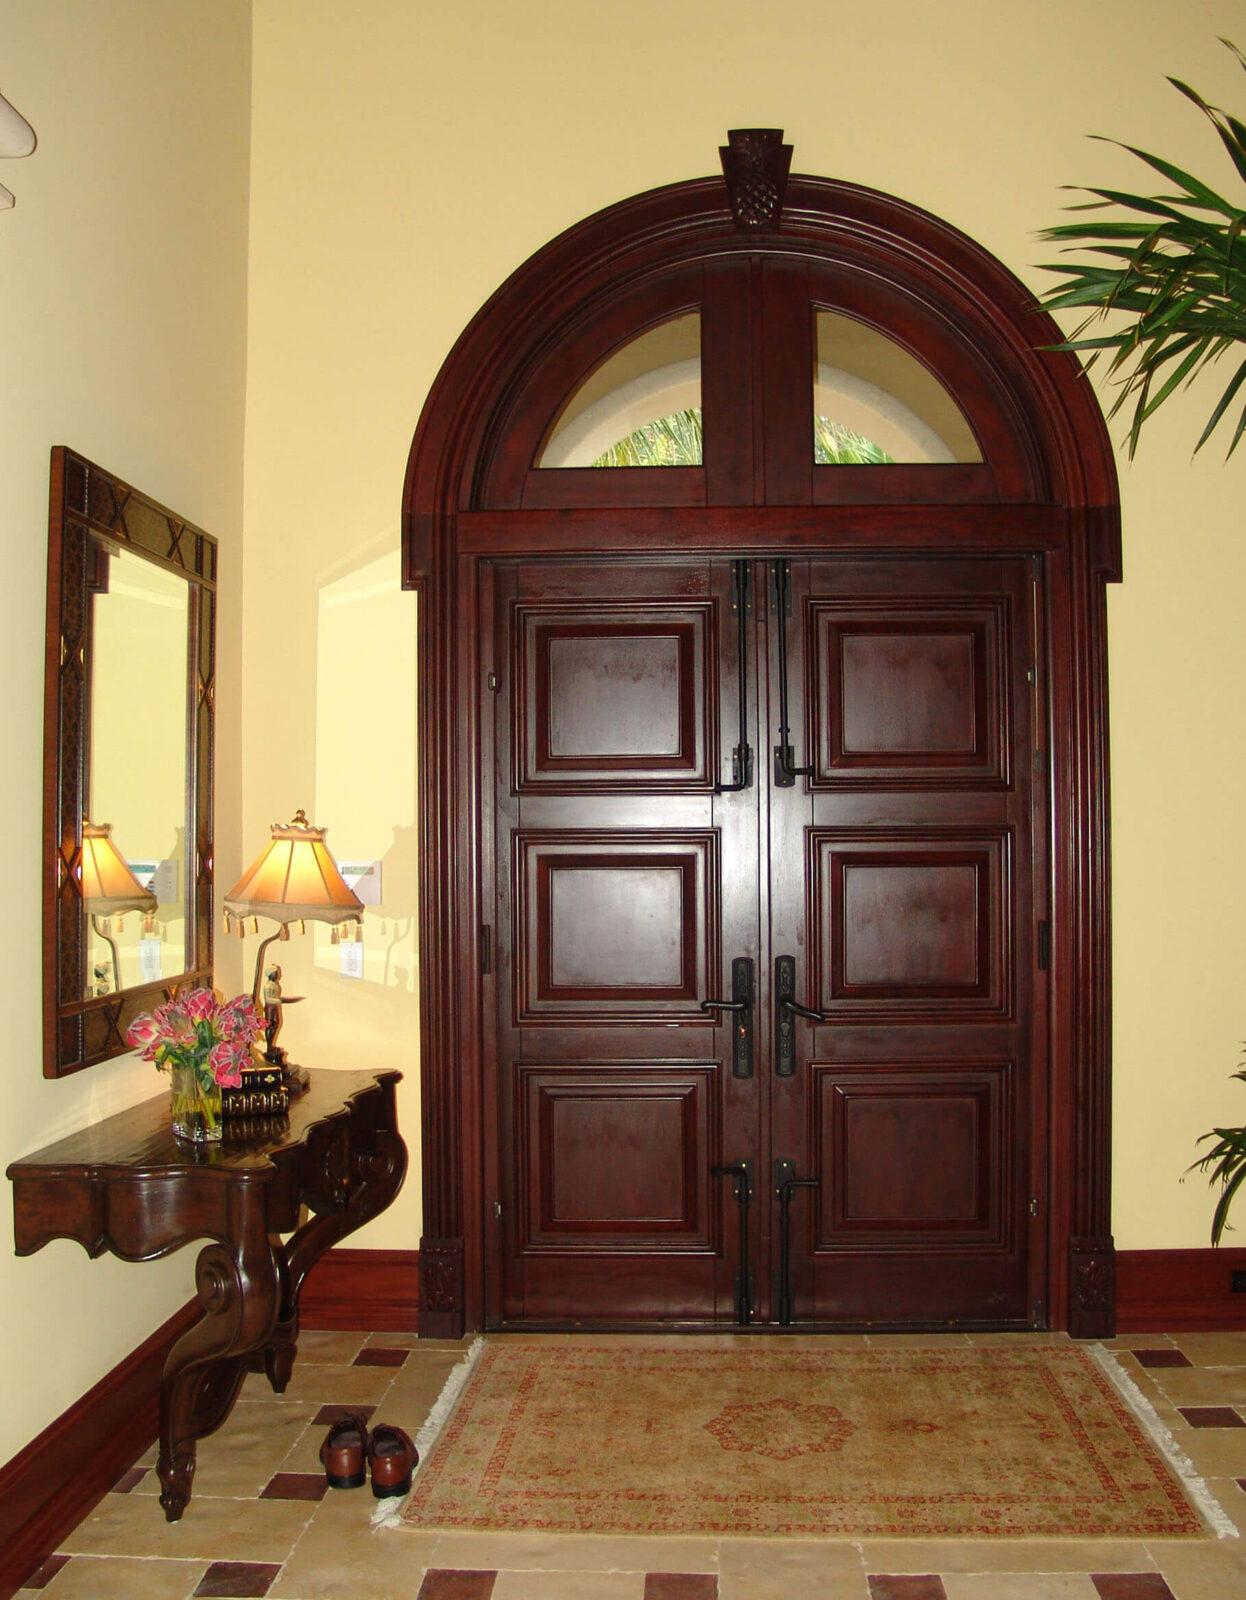 JUPITER MAHOGANY ENTRANCE DOORS INTERIOR VIEW